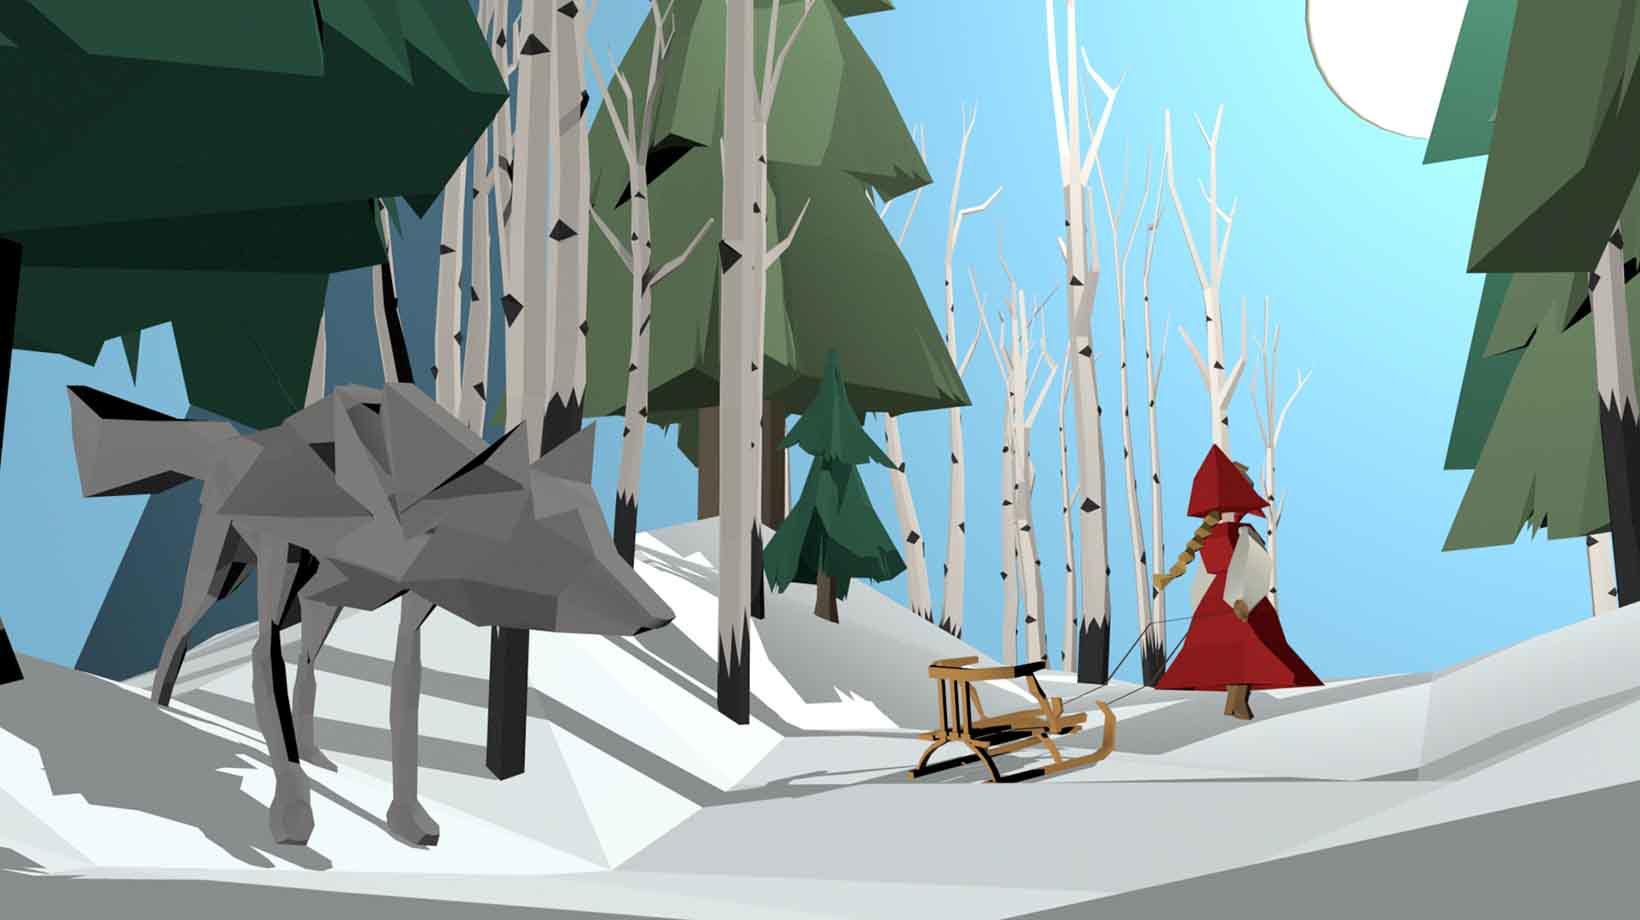 3D Animation Film - year 2